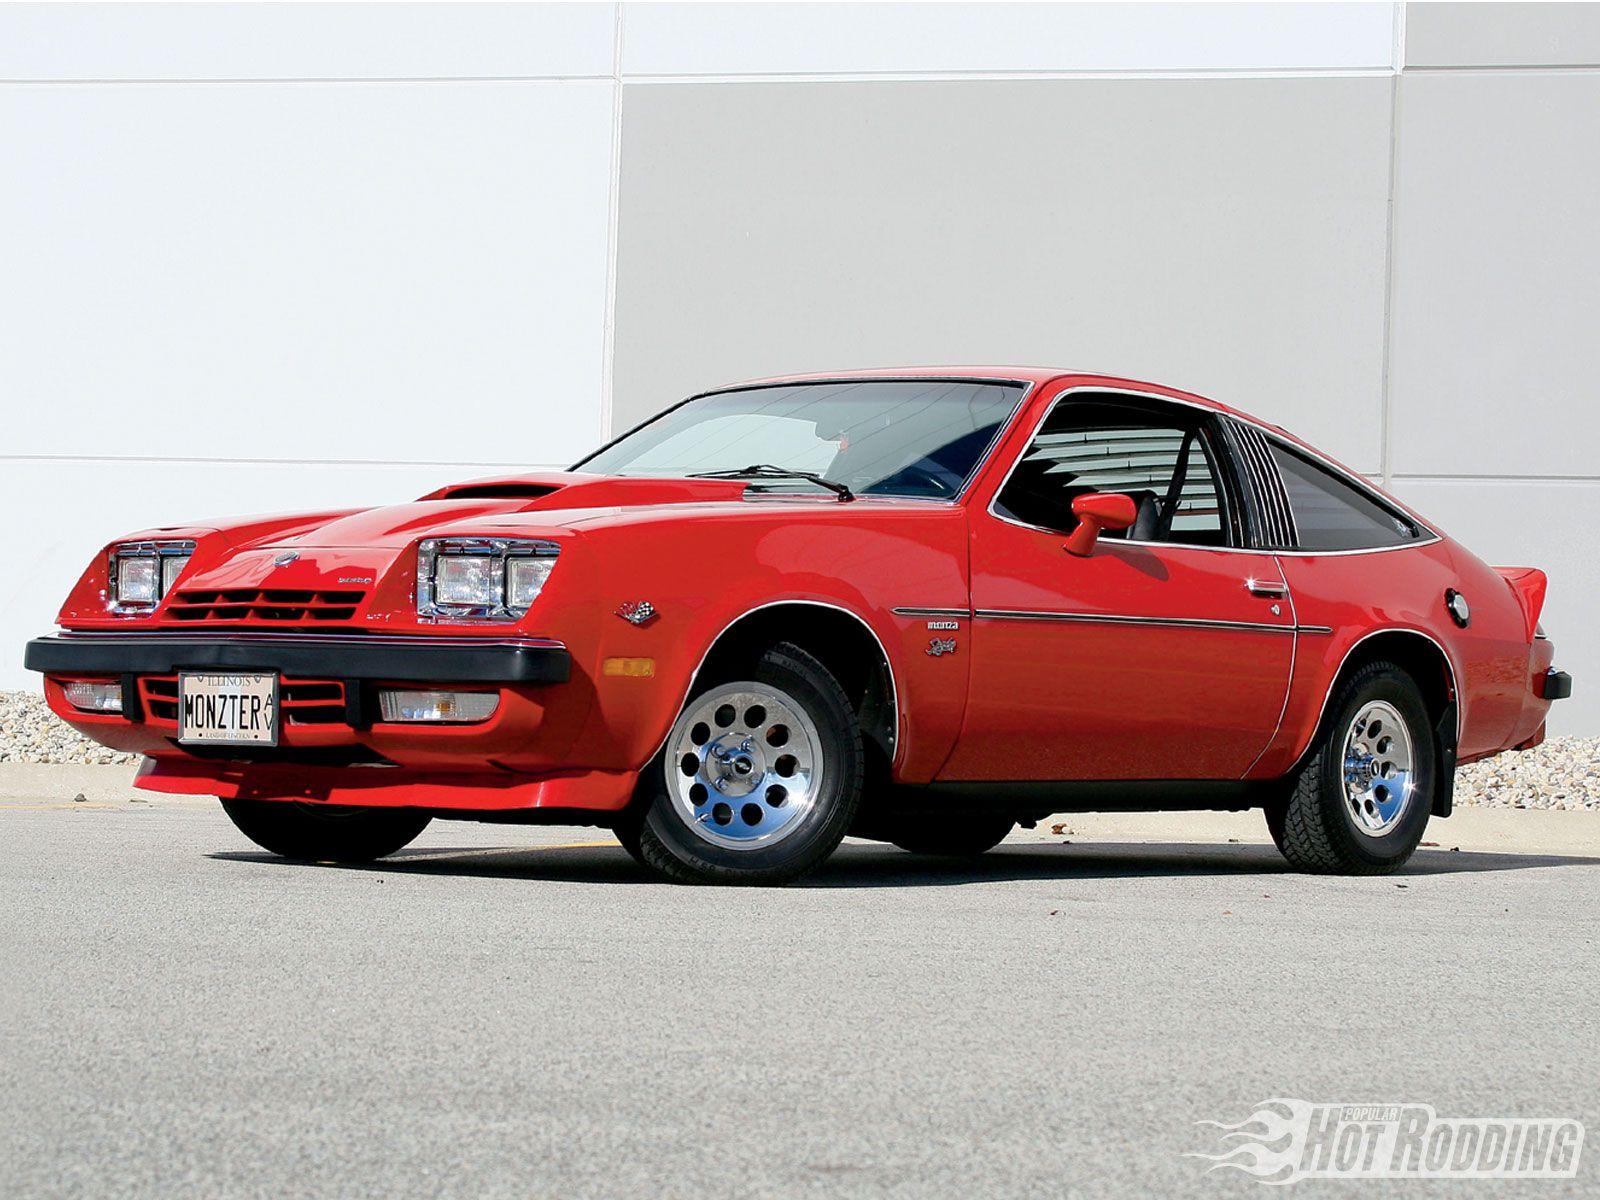 1977 Chevrolet Monza 16 Chevrolet Monza Chevrolet Classic